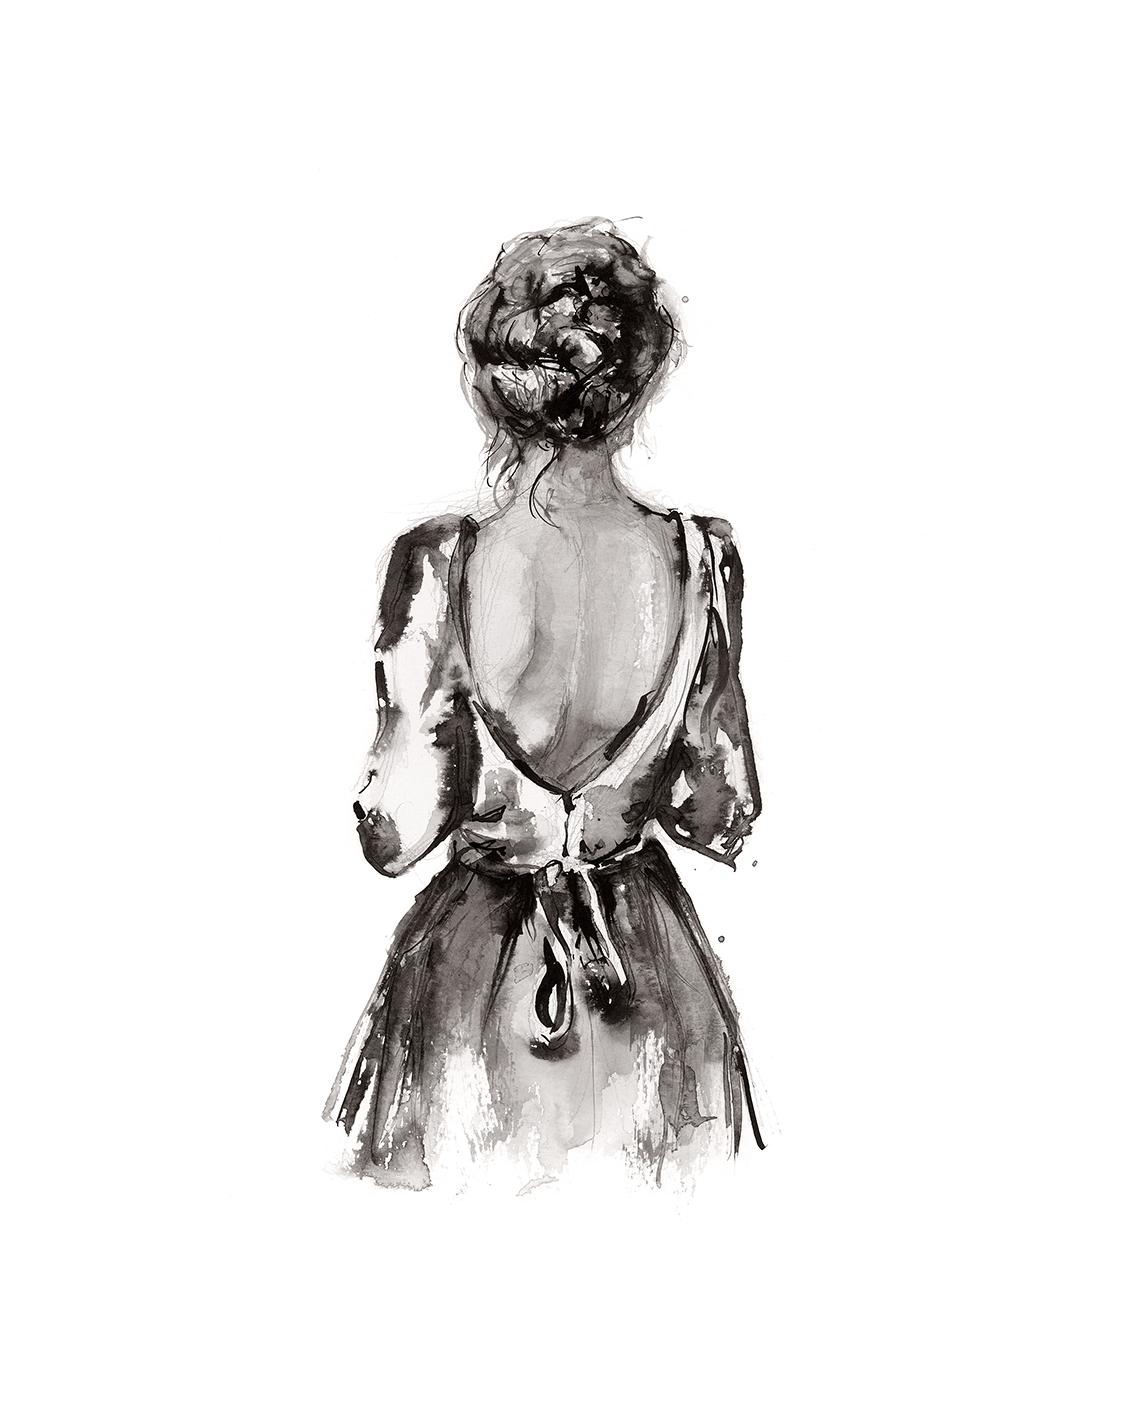 'Breath'.  Fine Art Print by Artist, Dana Trijbetz.  Original Ink Painting made as a Giclée Print on 100% Cotton Paper.  Image 2 of 4.jpg